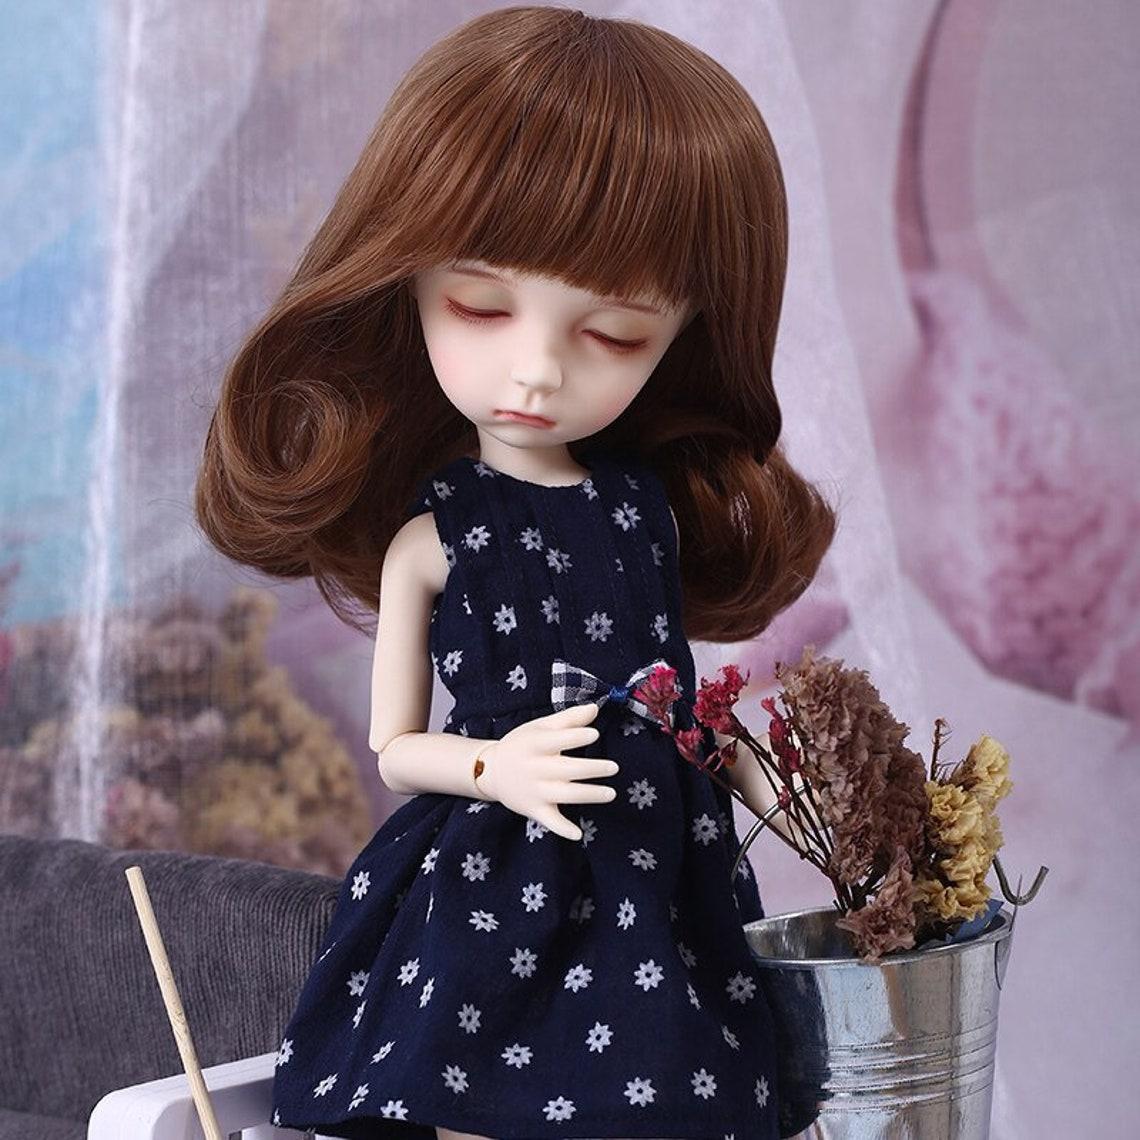 Imda2.6 Amellia 1/6 BJD SD Doll Body Girls Boys Resin